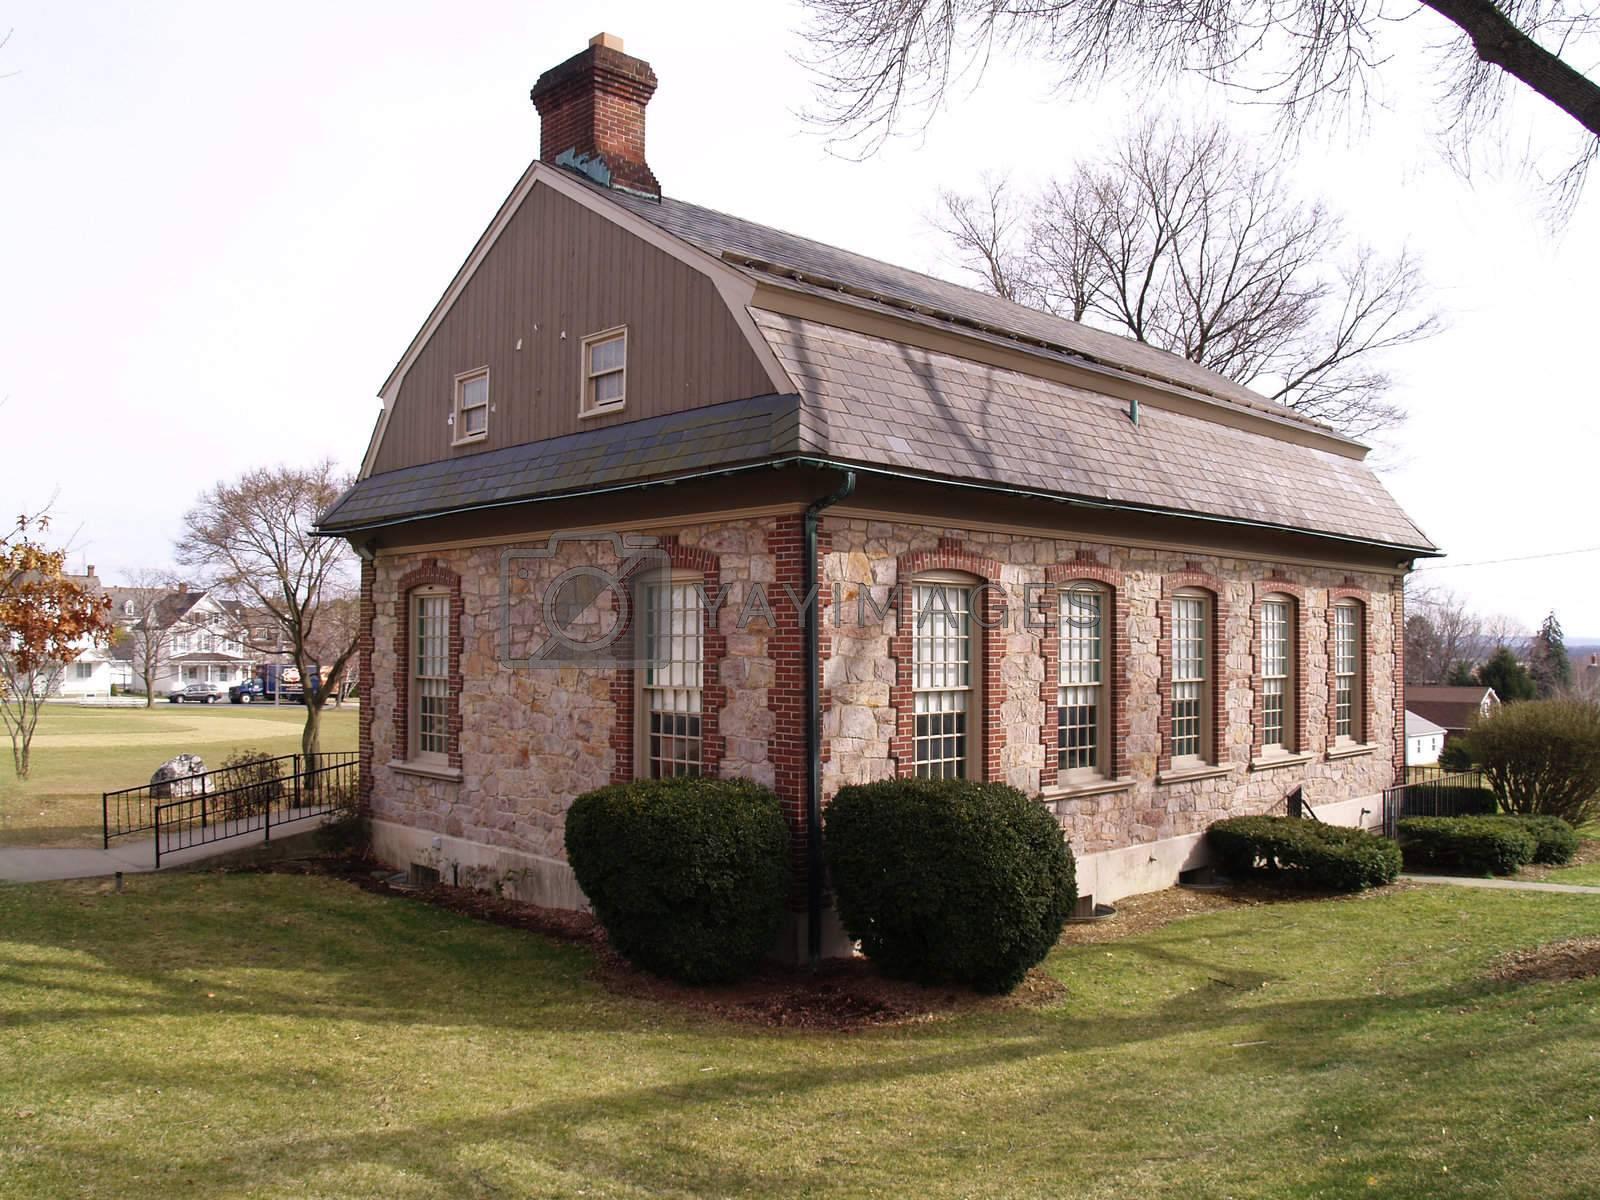 colonial style stone building in Nazareth, Pennsylvania